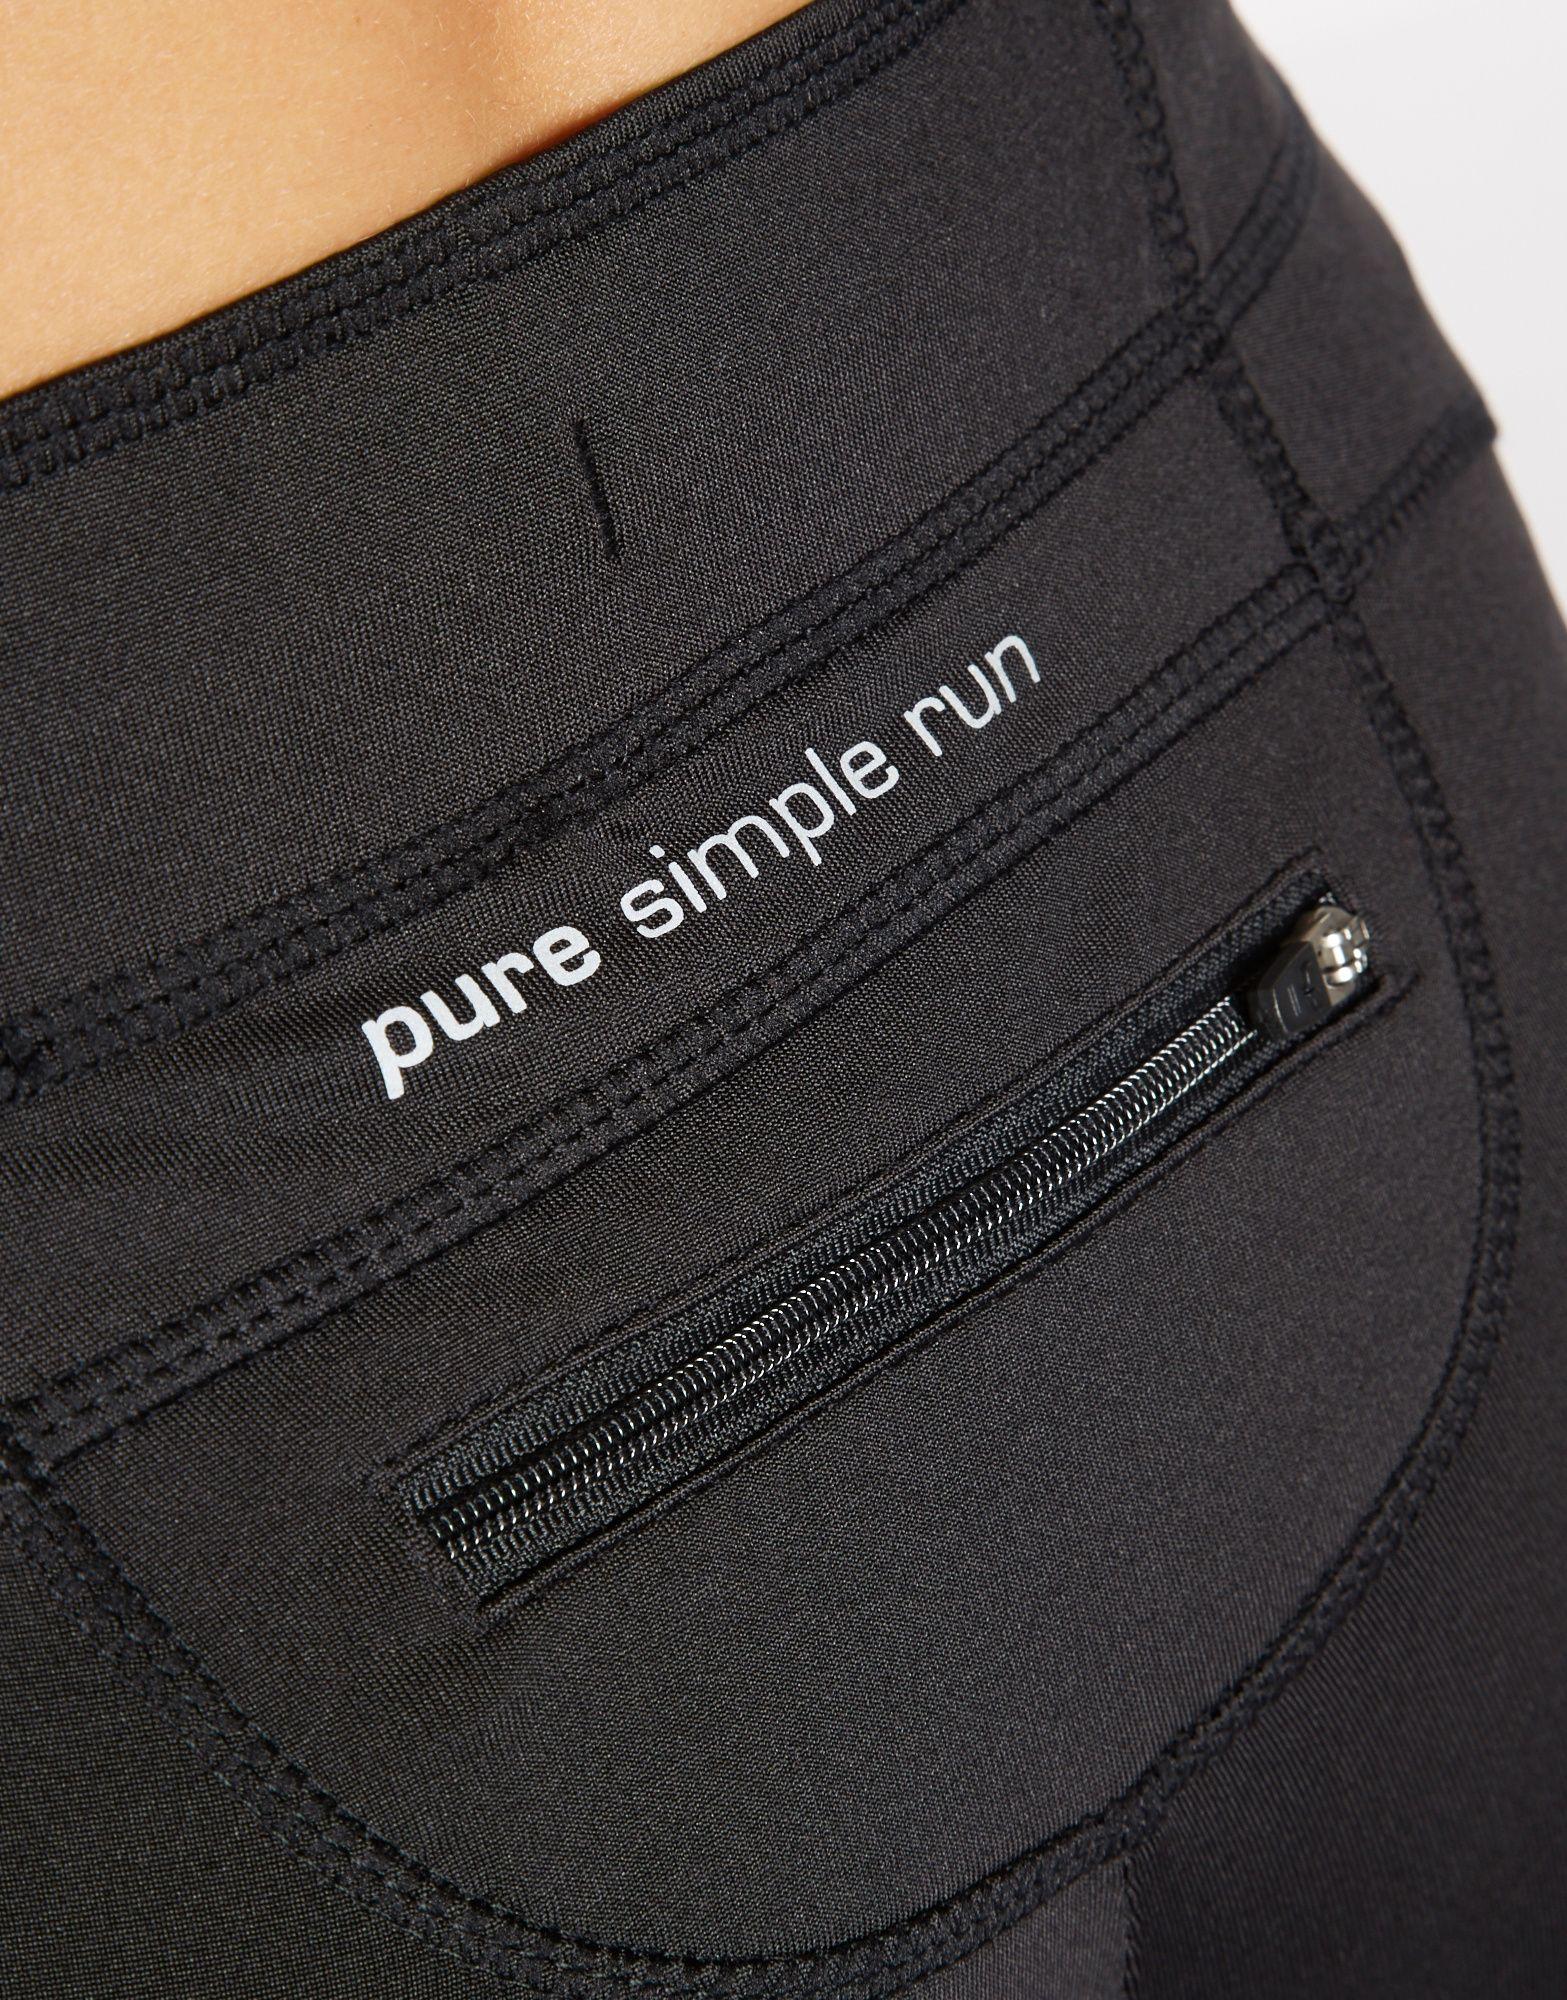 Pure Simple Sport Podium Mesh Tights